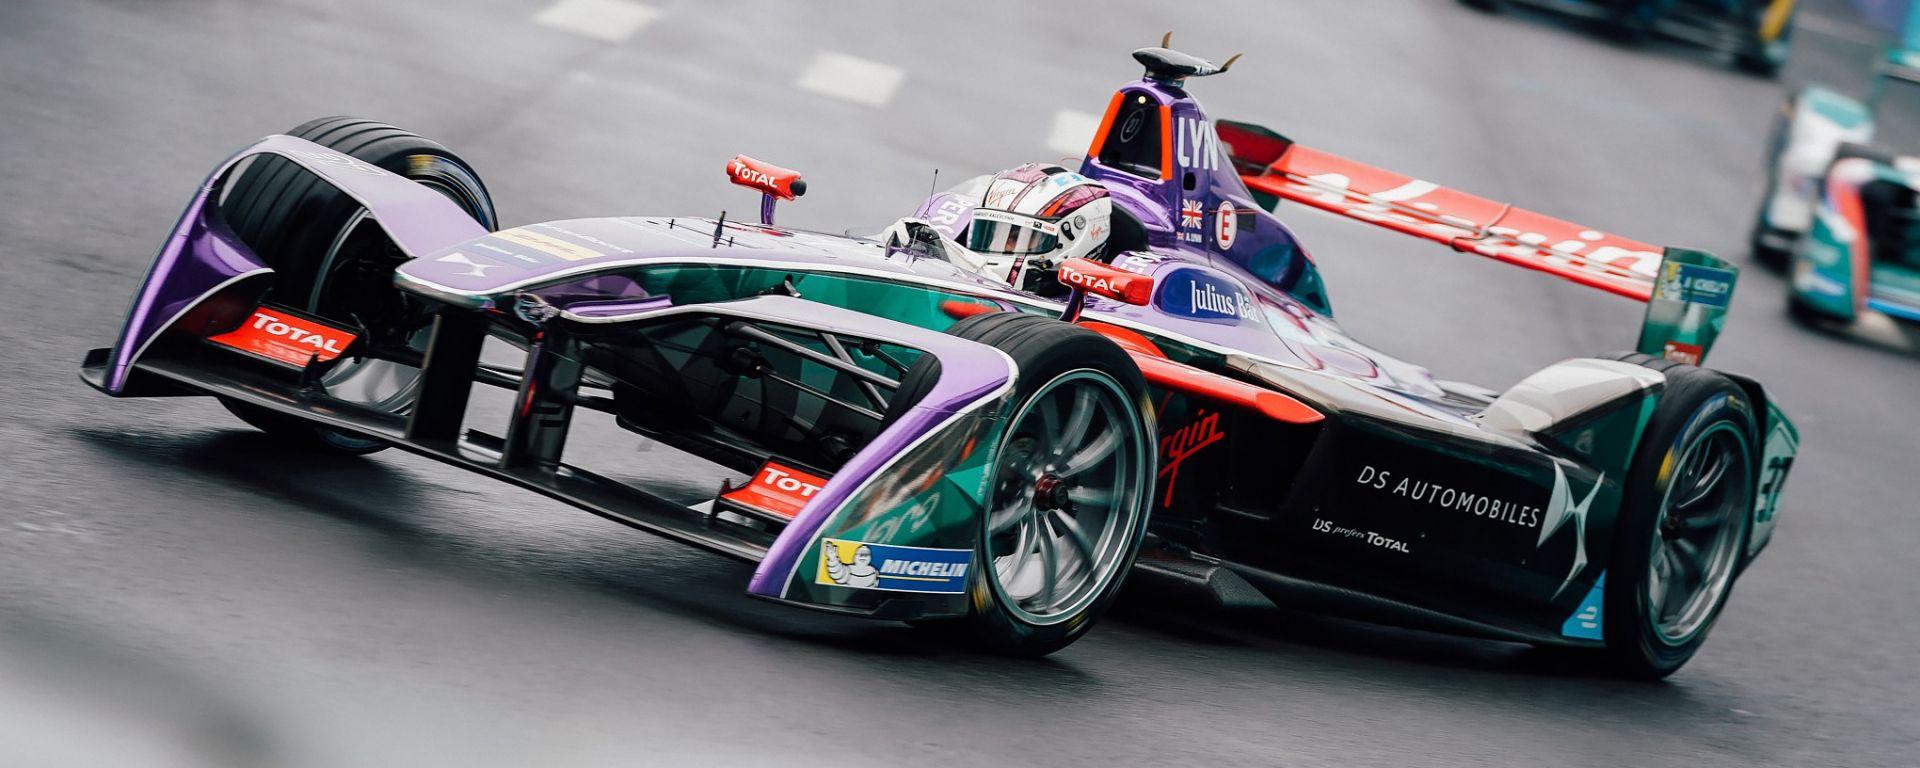 Formula E ePrix del Brasile 2017/2018